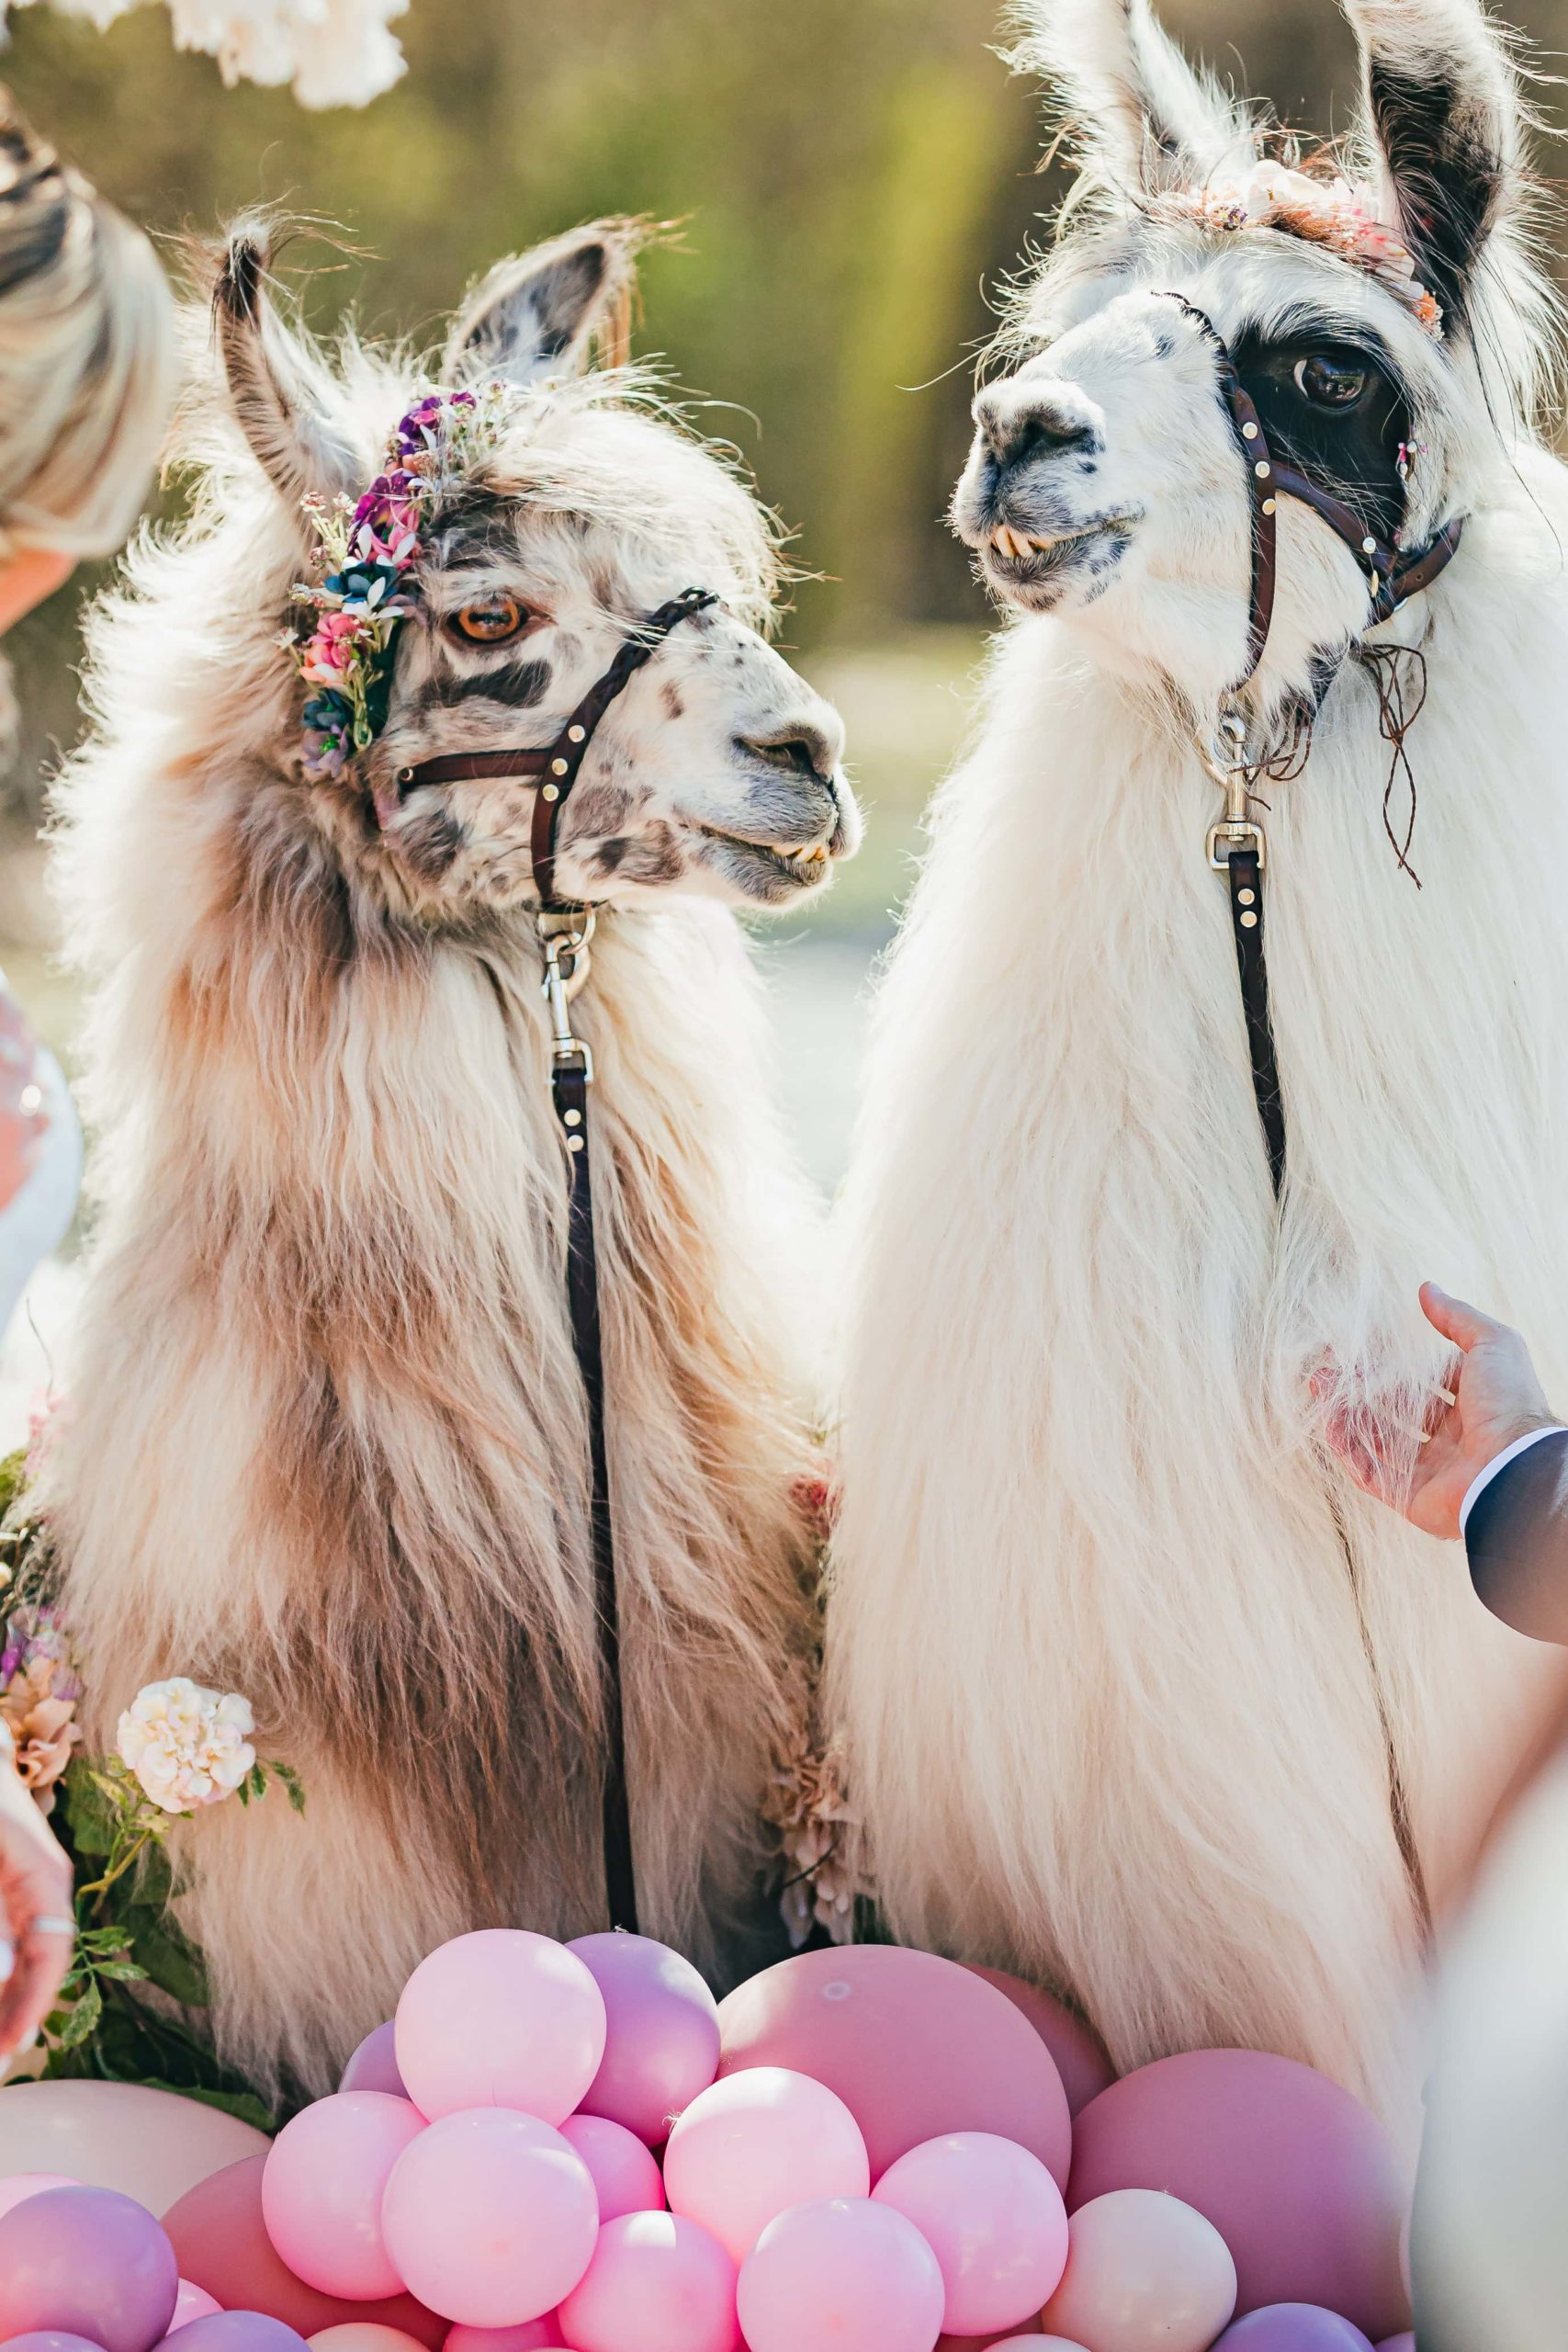 llama-bridgerton-proposal-love-and-story-roswell-9957